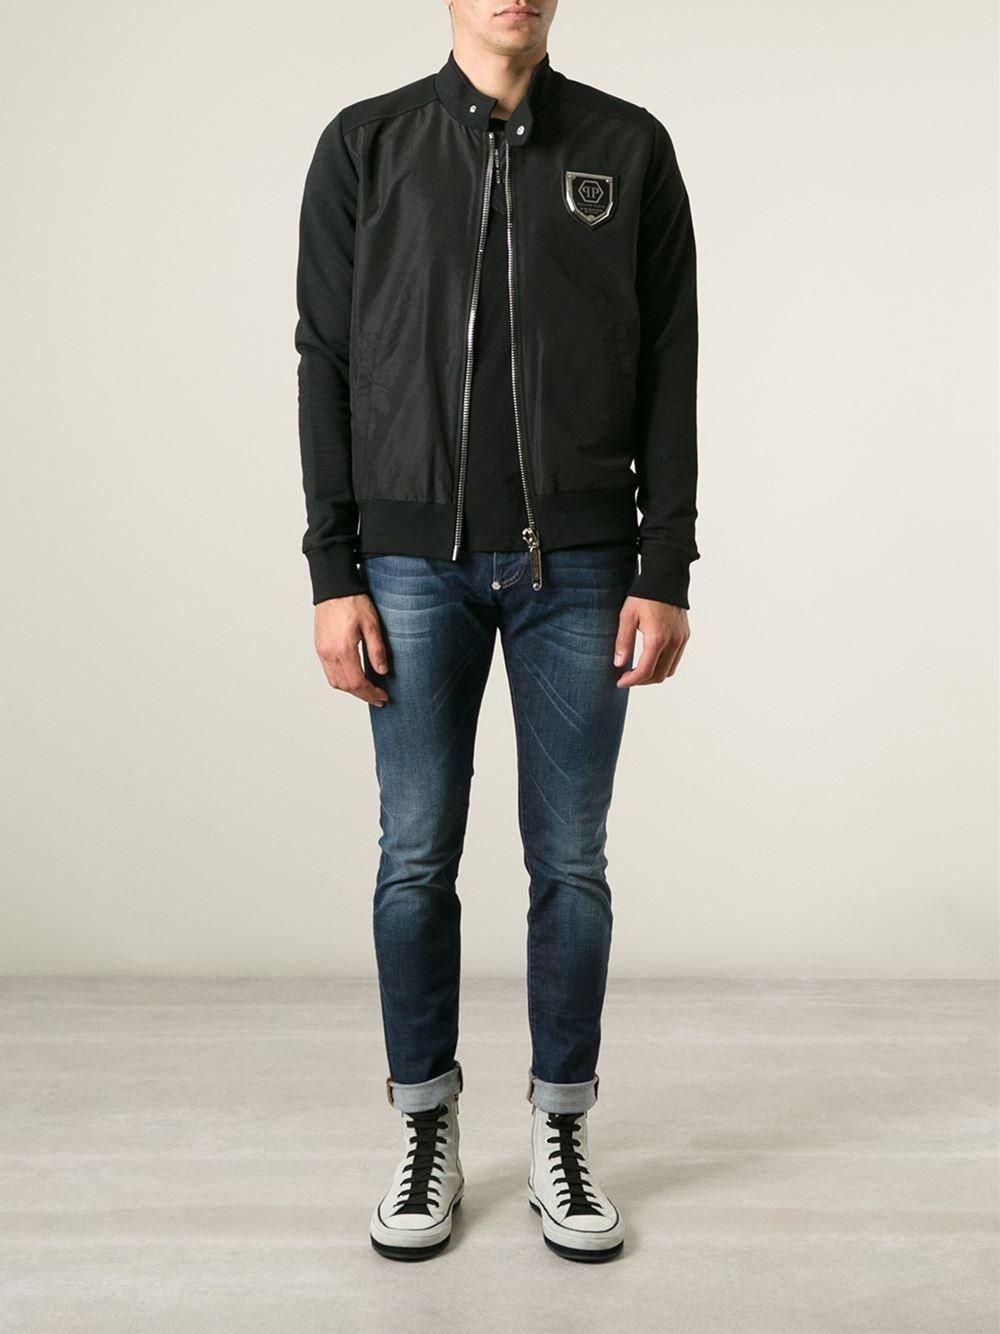 philipp plein 39 turn down 39 sweat jacket in black for men lyst. Black Bedroom Furniture Sets. Home Design Ideas